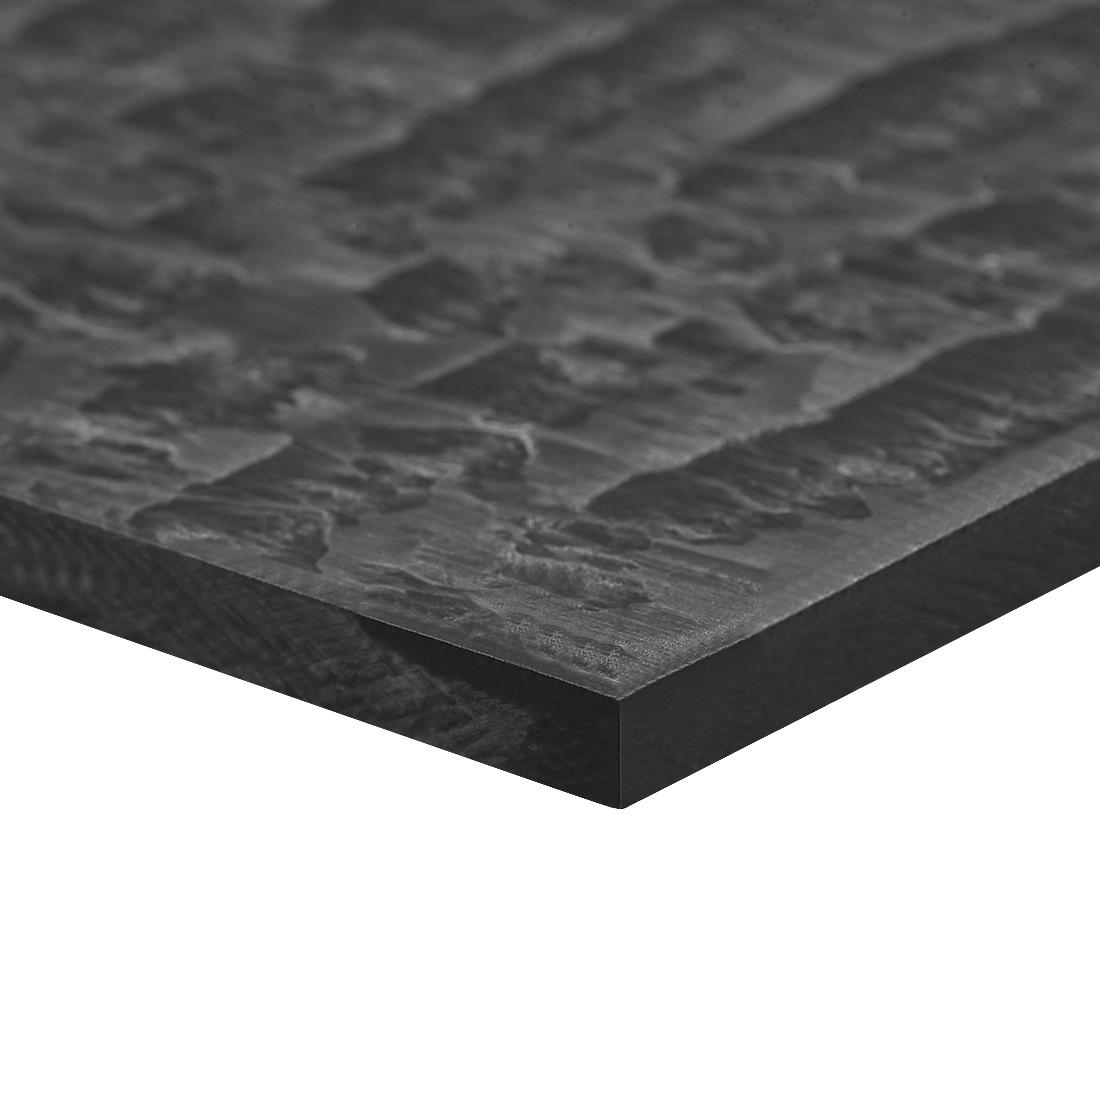 Acetal POM Sheet Polyoxymethylene Plate Sheet 300 x 200 x 6mm Black